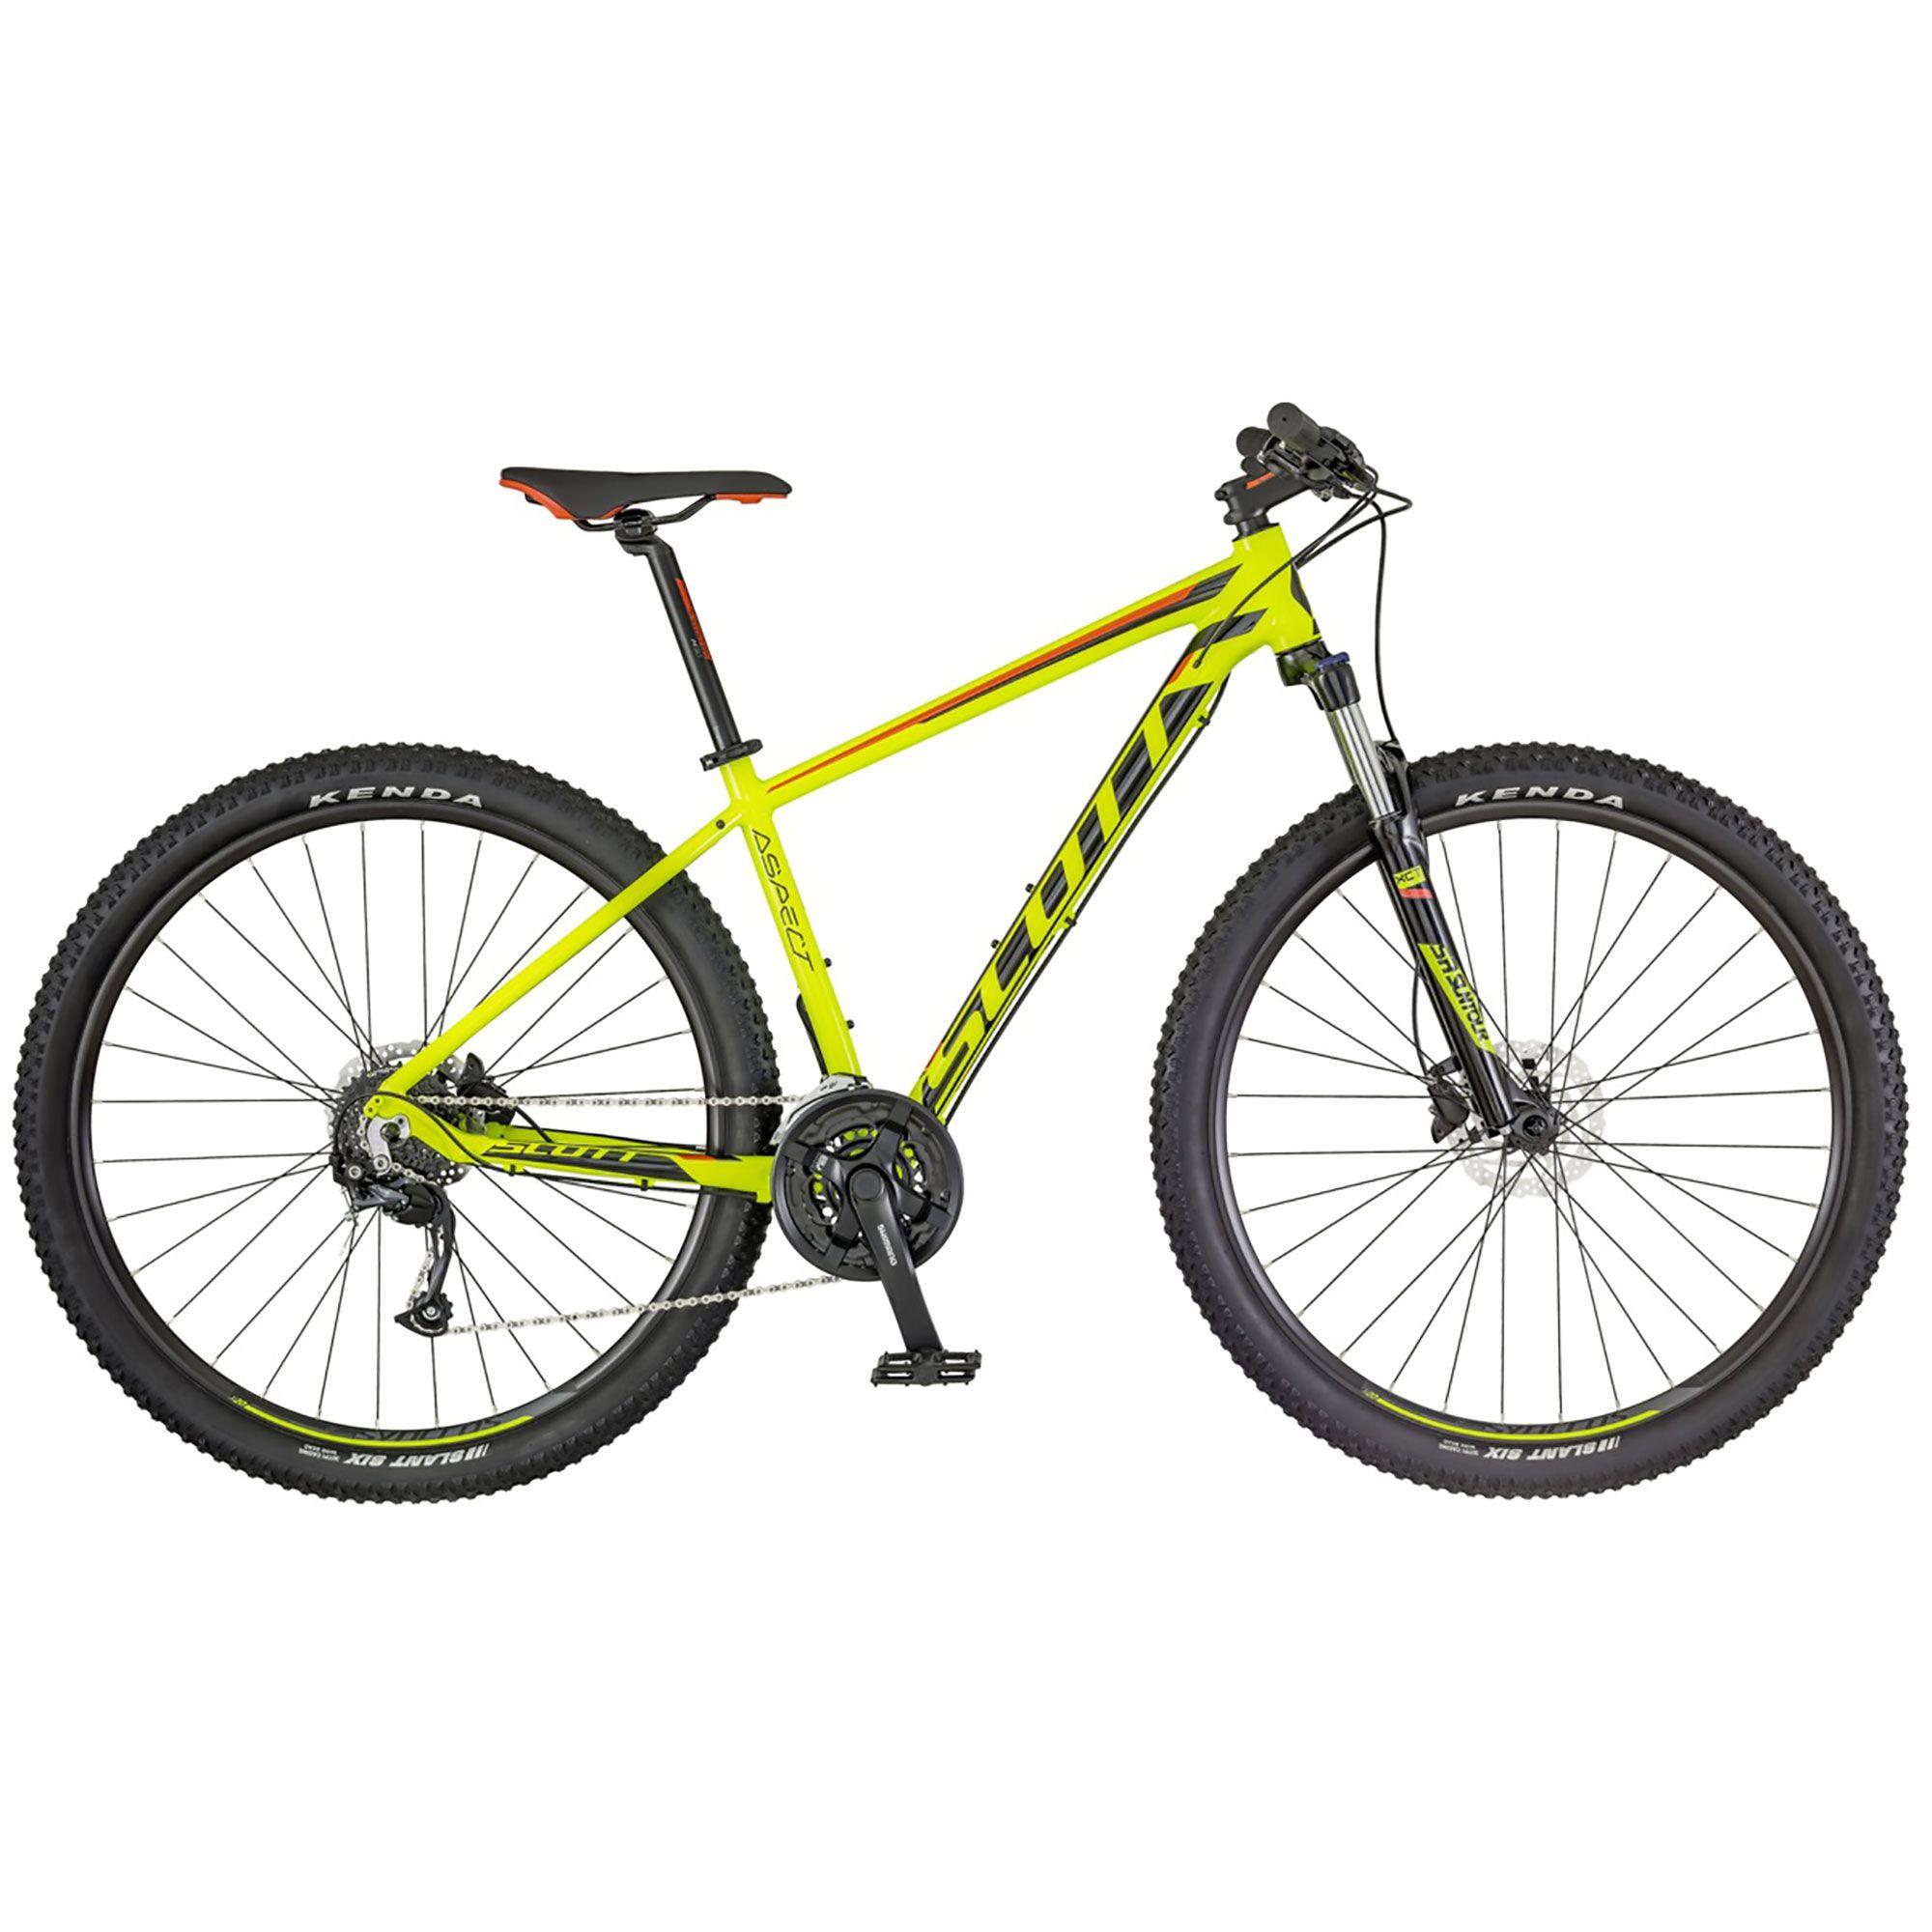 Scott Aspect 750 Hardtail Mountain Bike - 27.5 Inch - 2018 £299 delivered at Tweeks